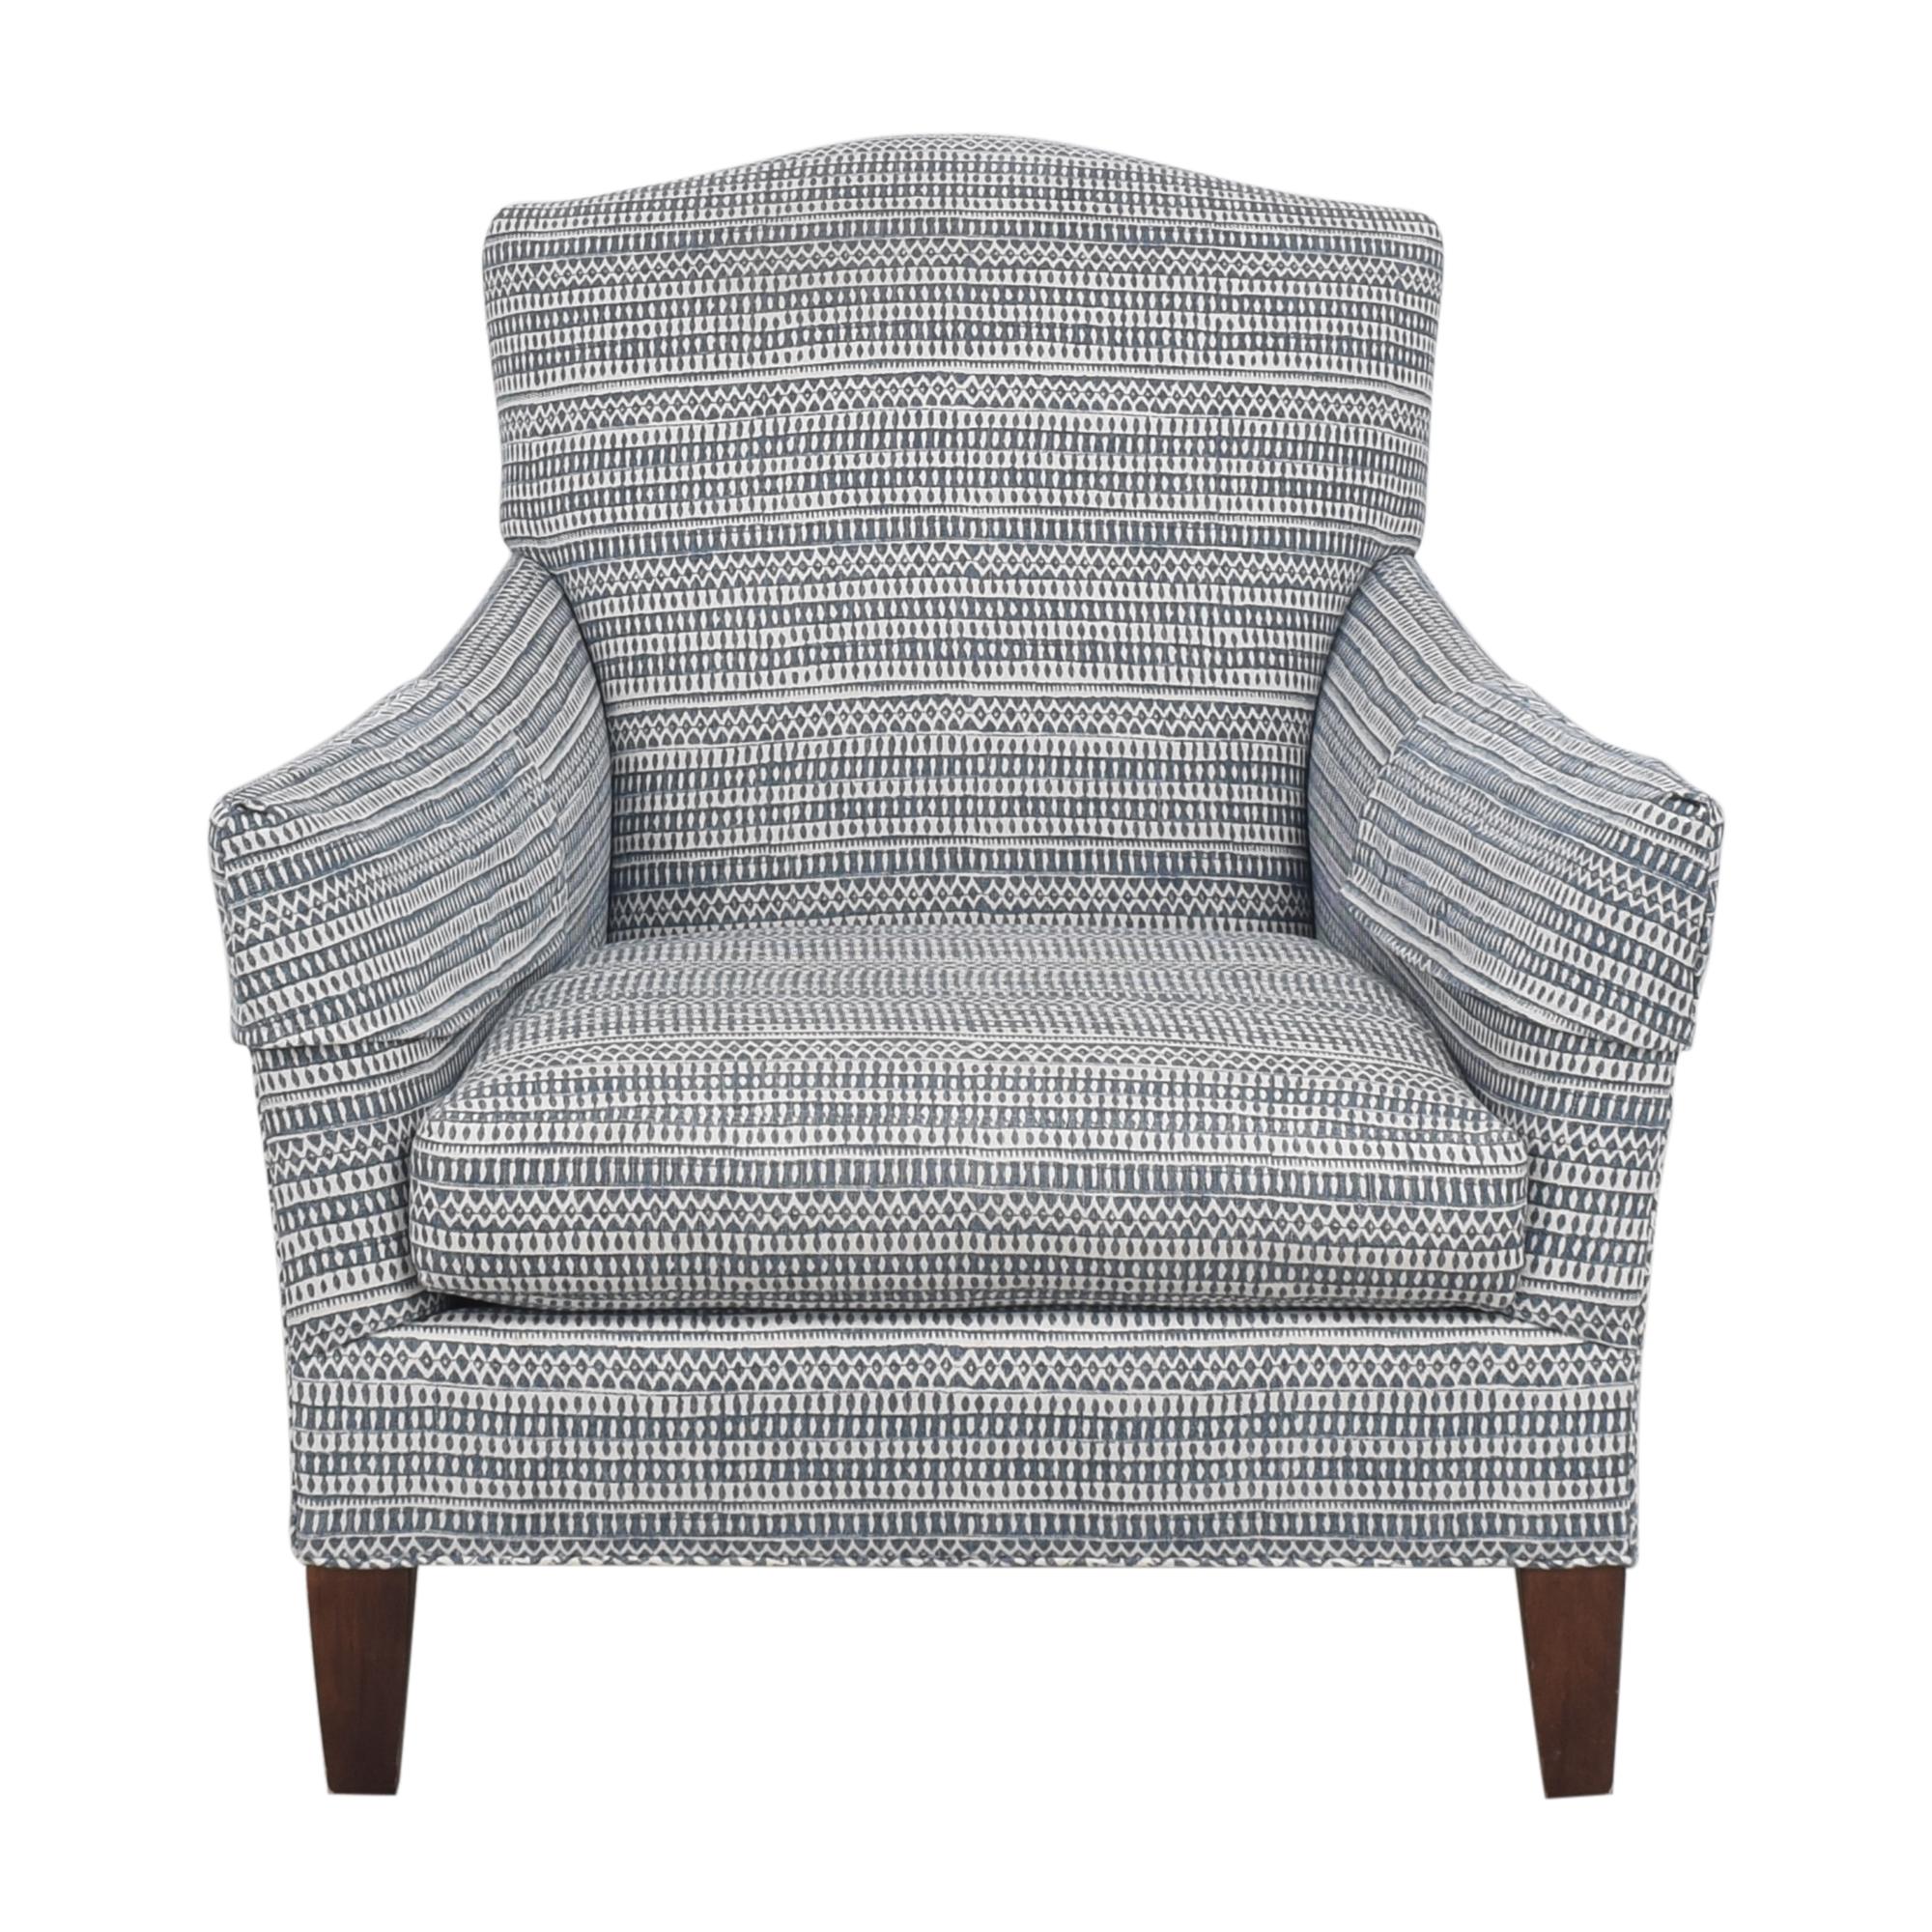 ABC Carpet & Home ABC Carpet & Home Accent Chair nj